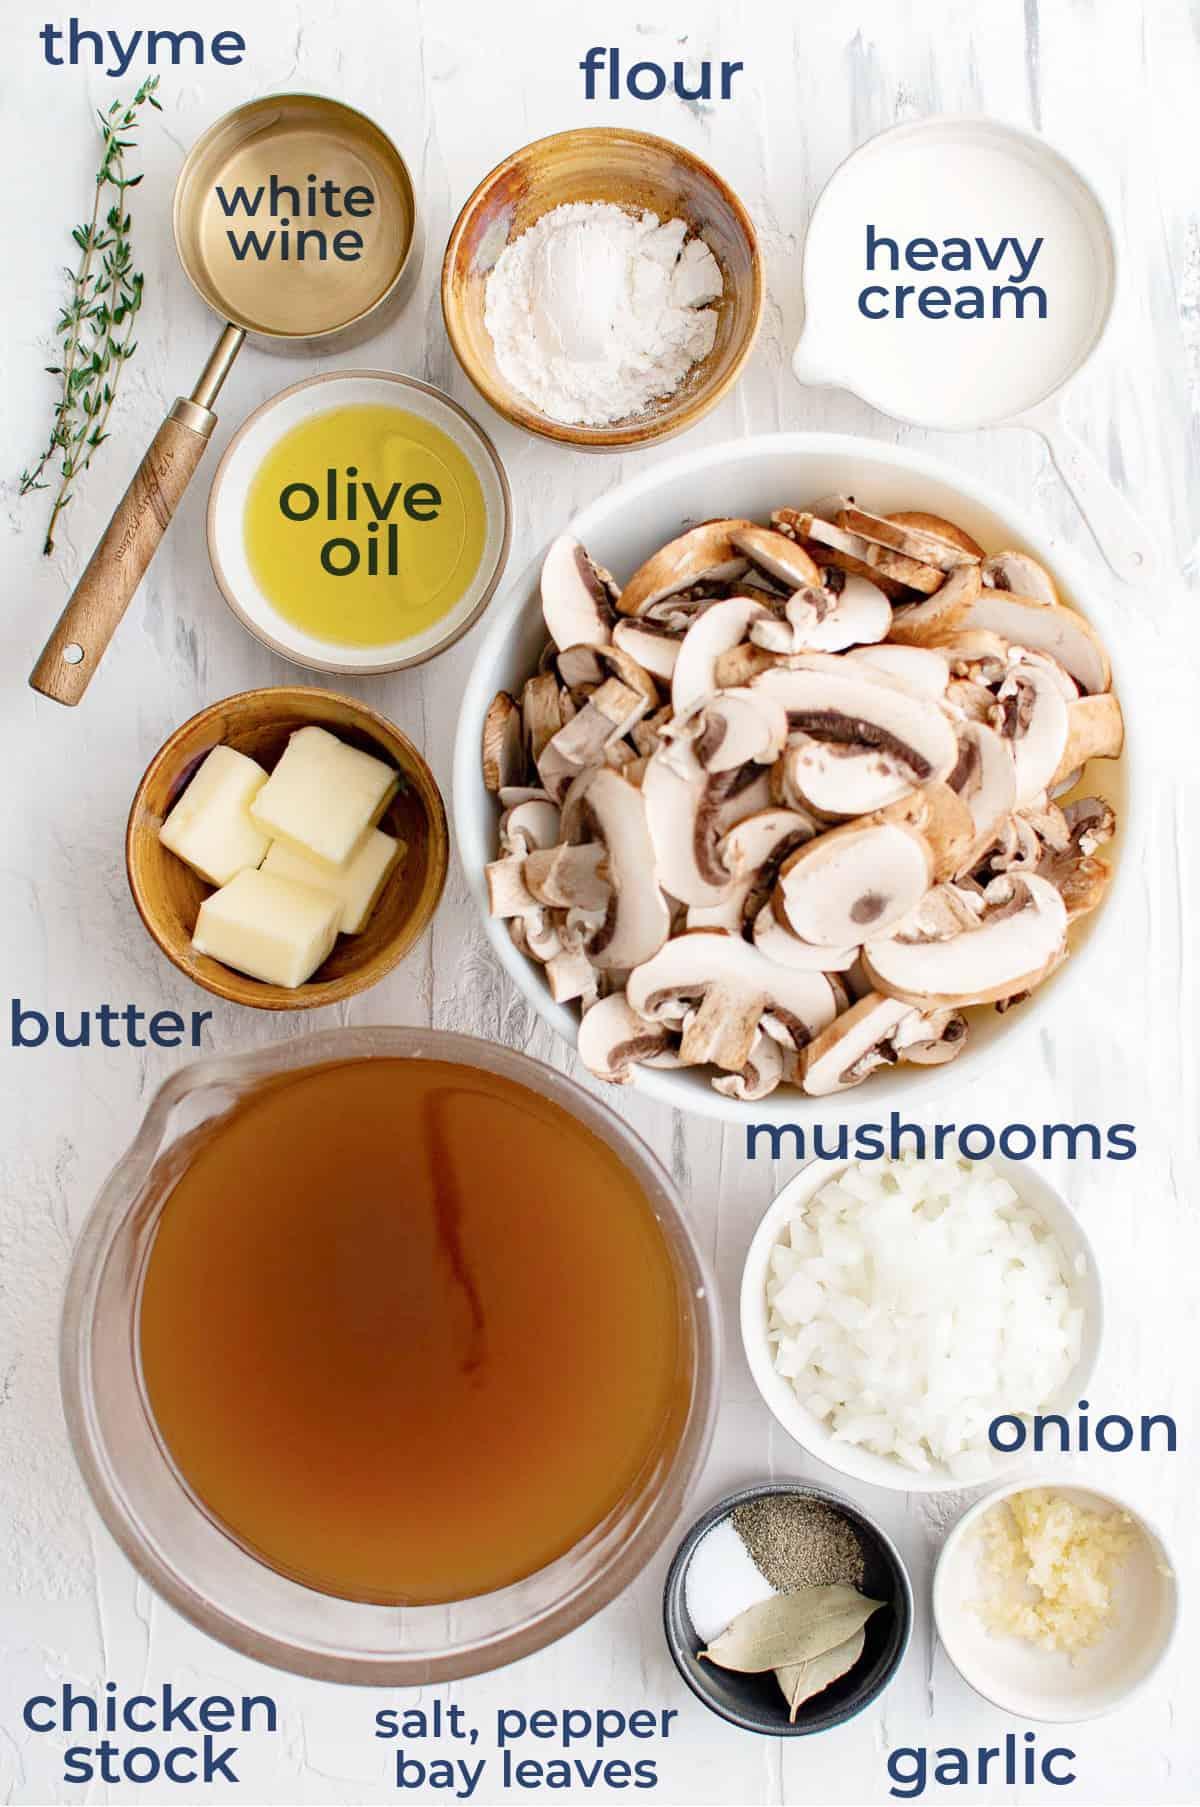 mushrooms, cream, onion, garlic, thyme, white wine, chicken stock, seasonings, butter all in separate bowls